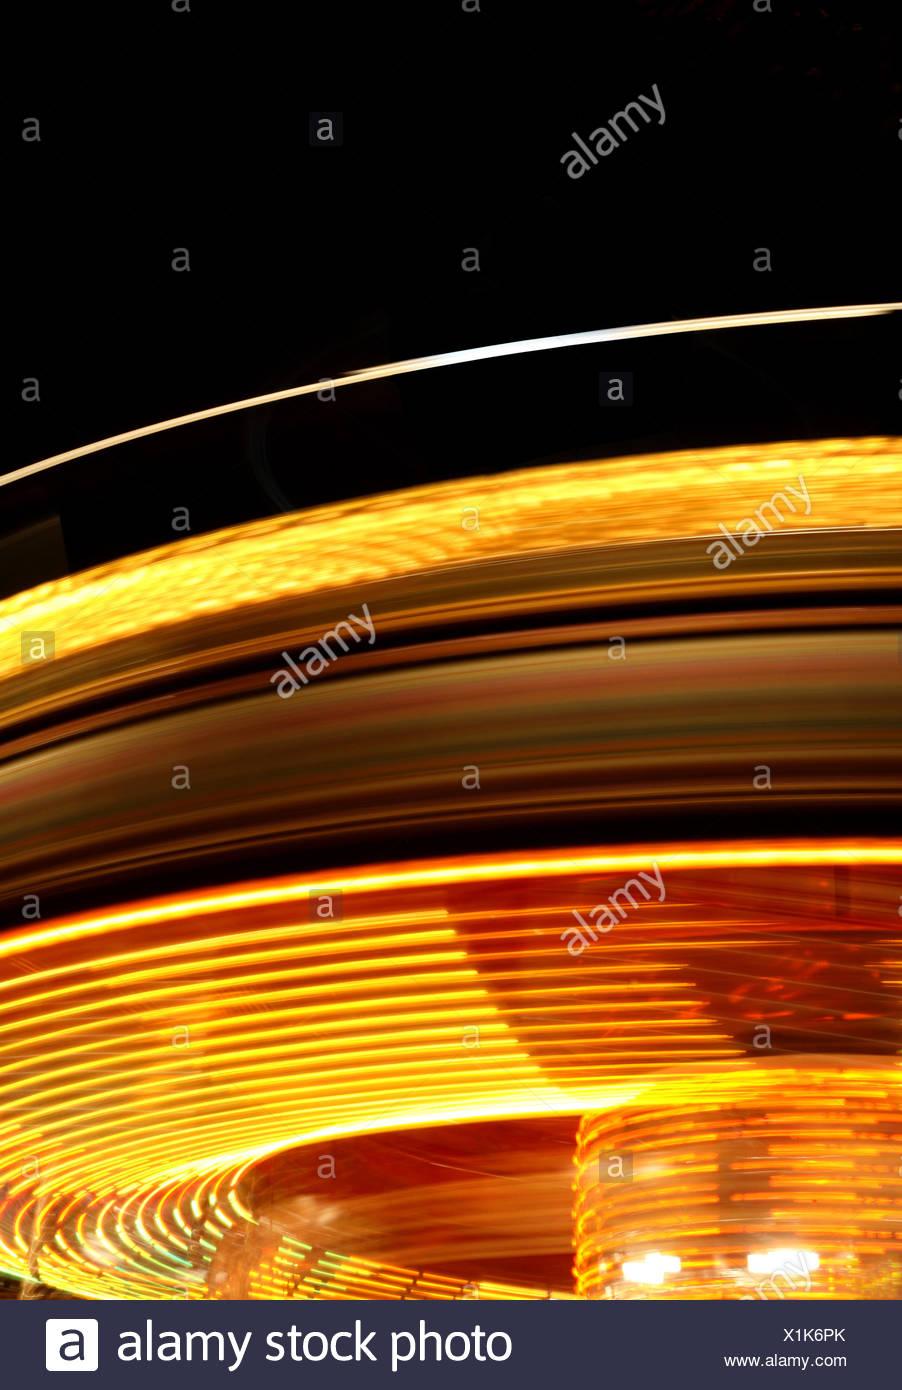 Rotating fairground ride at night - Stock Image